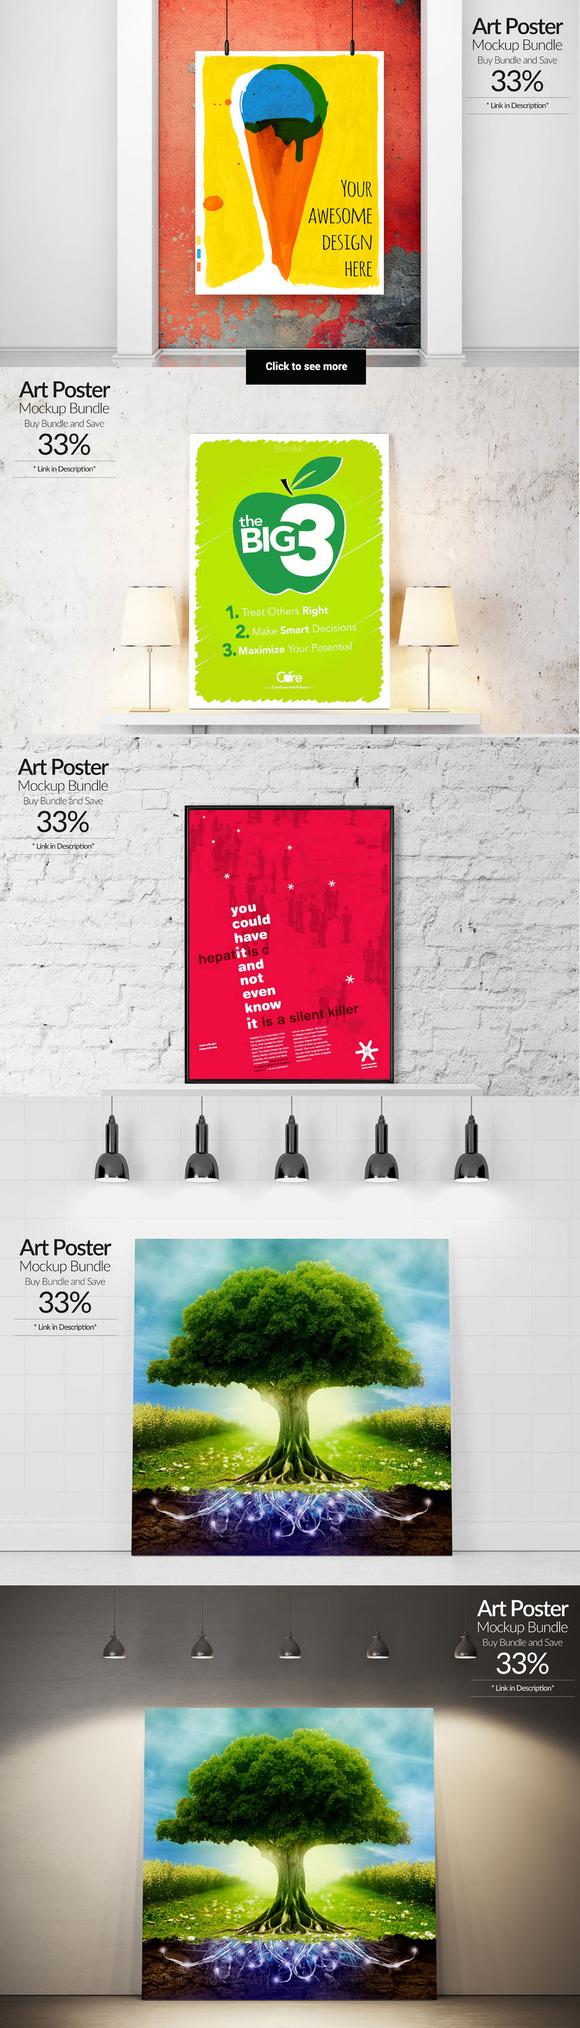 Art Poster Mockup Bundle